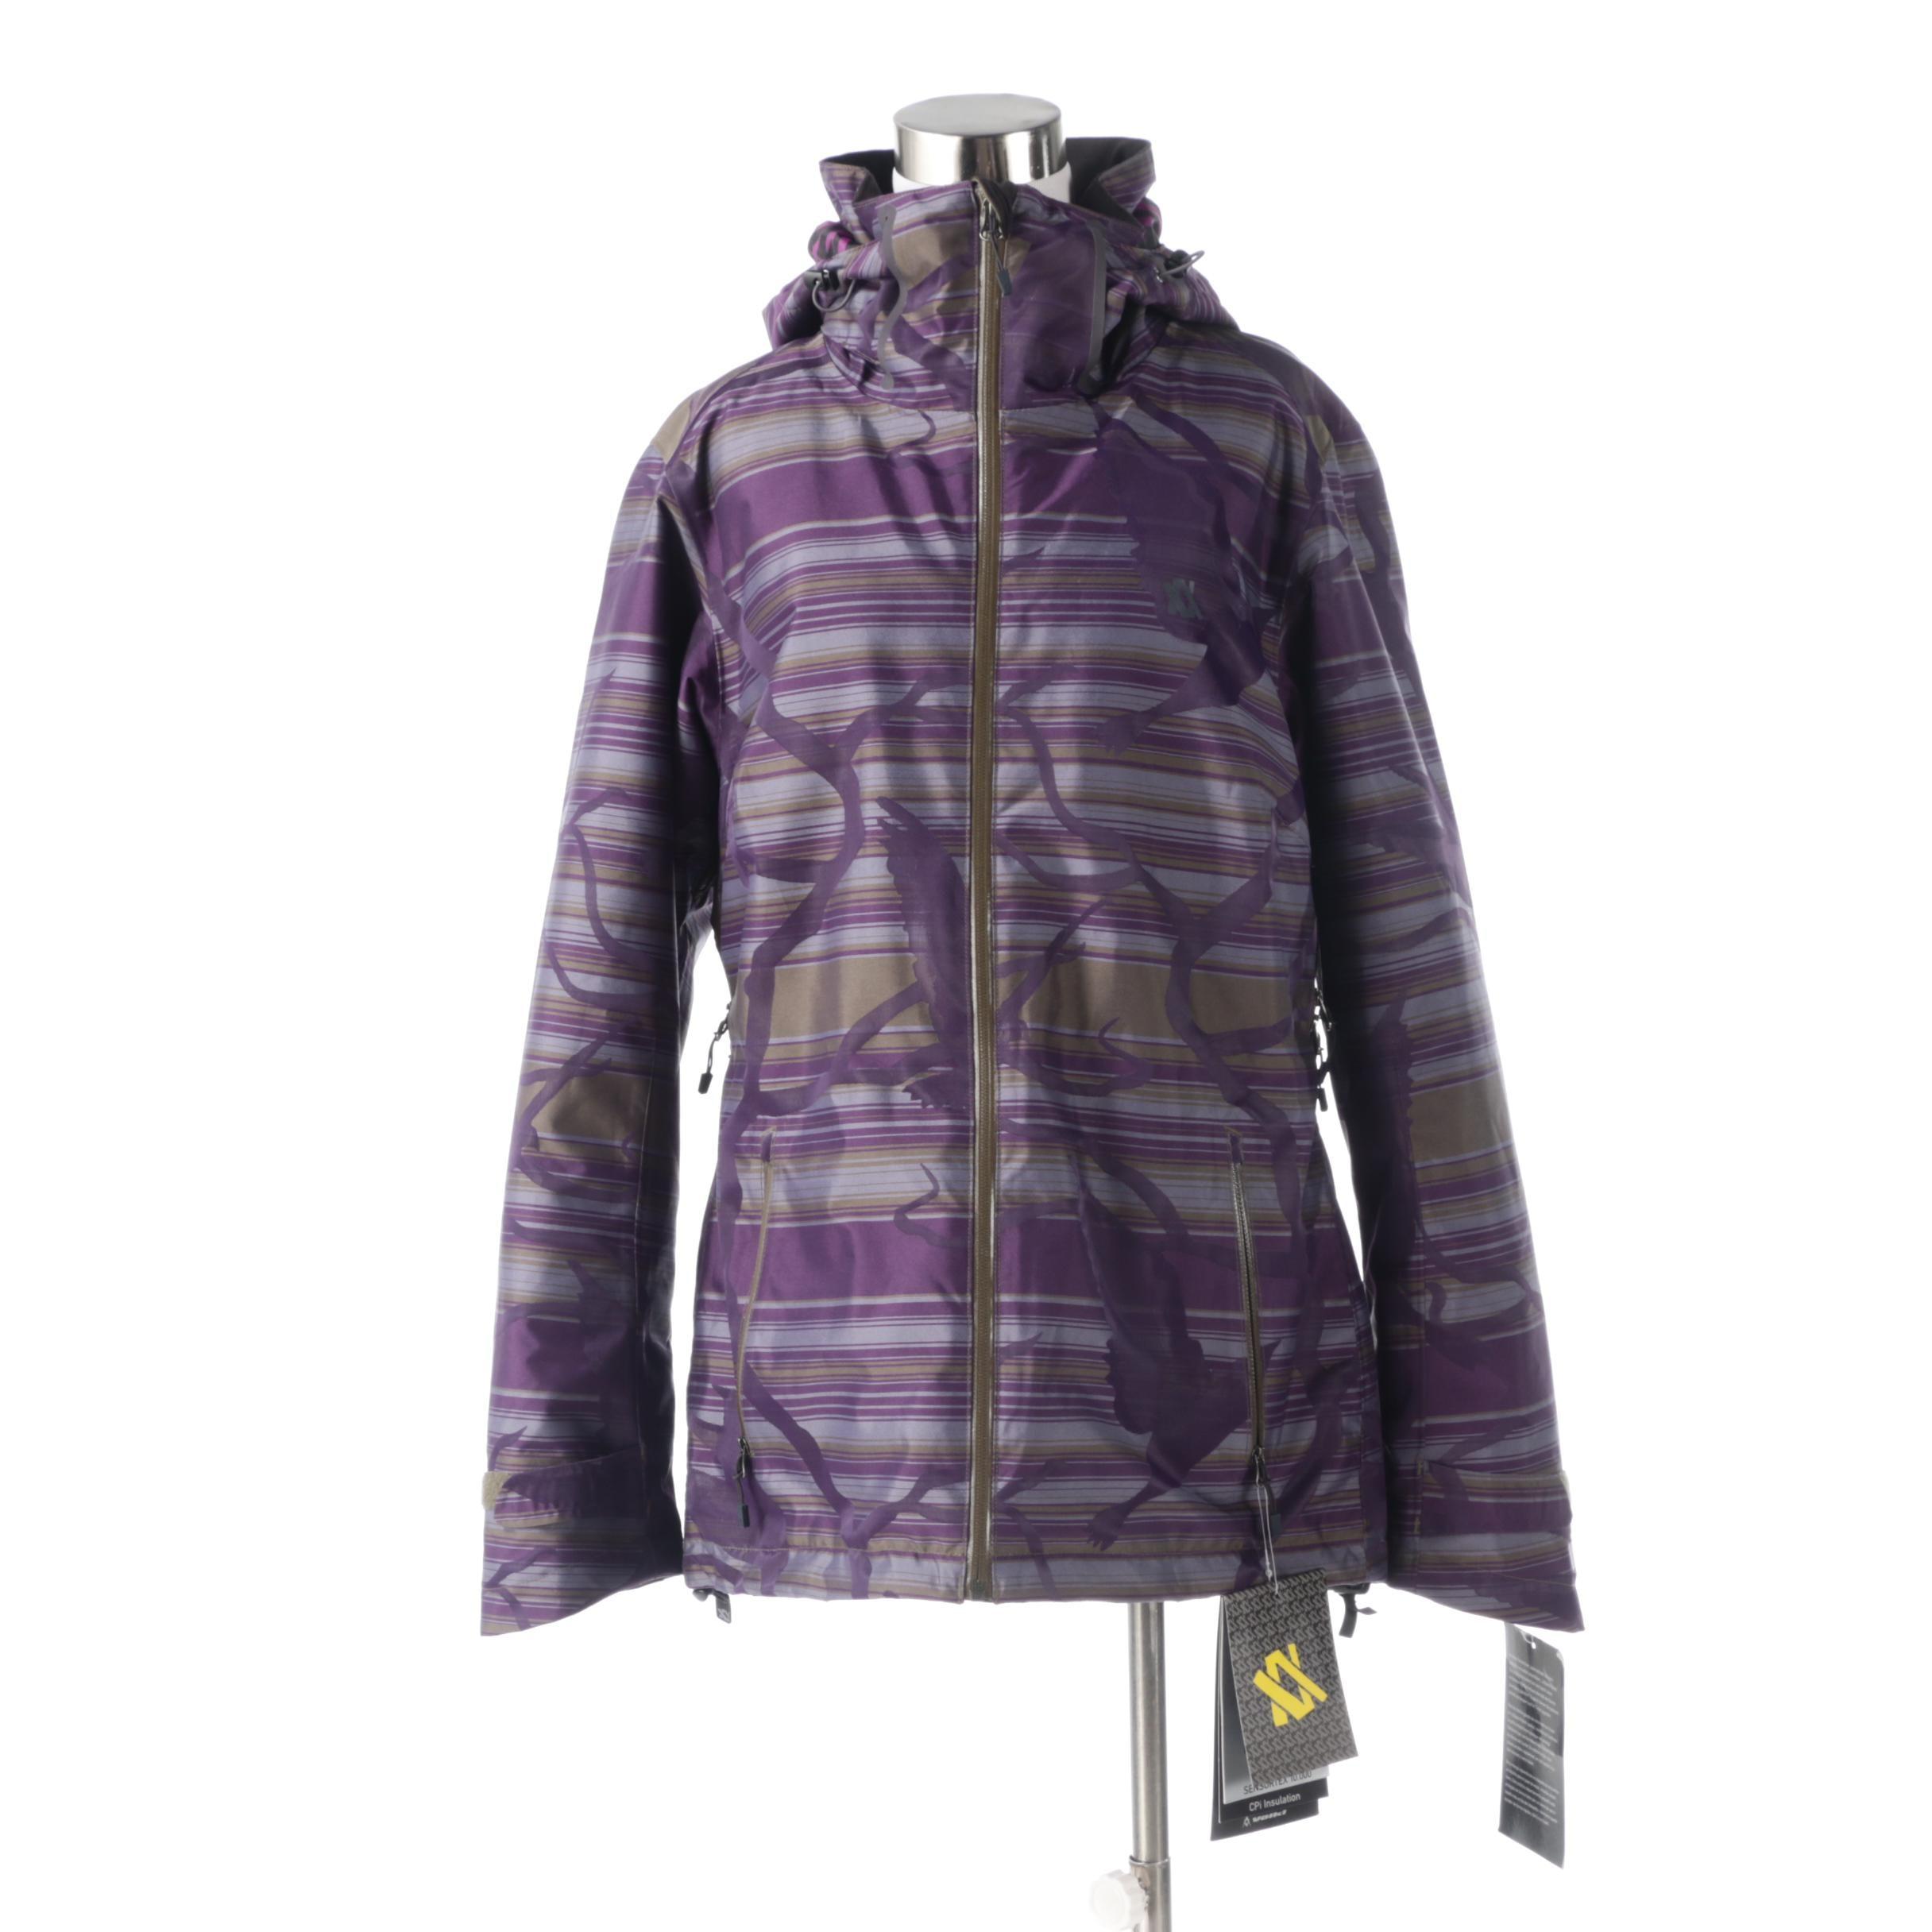 Women's Völkl Manu Hooded Insulated Ski Jacket in Purple and Olive Green